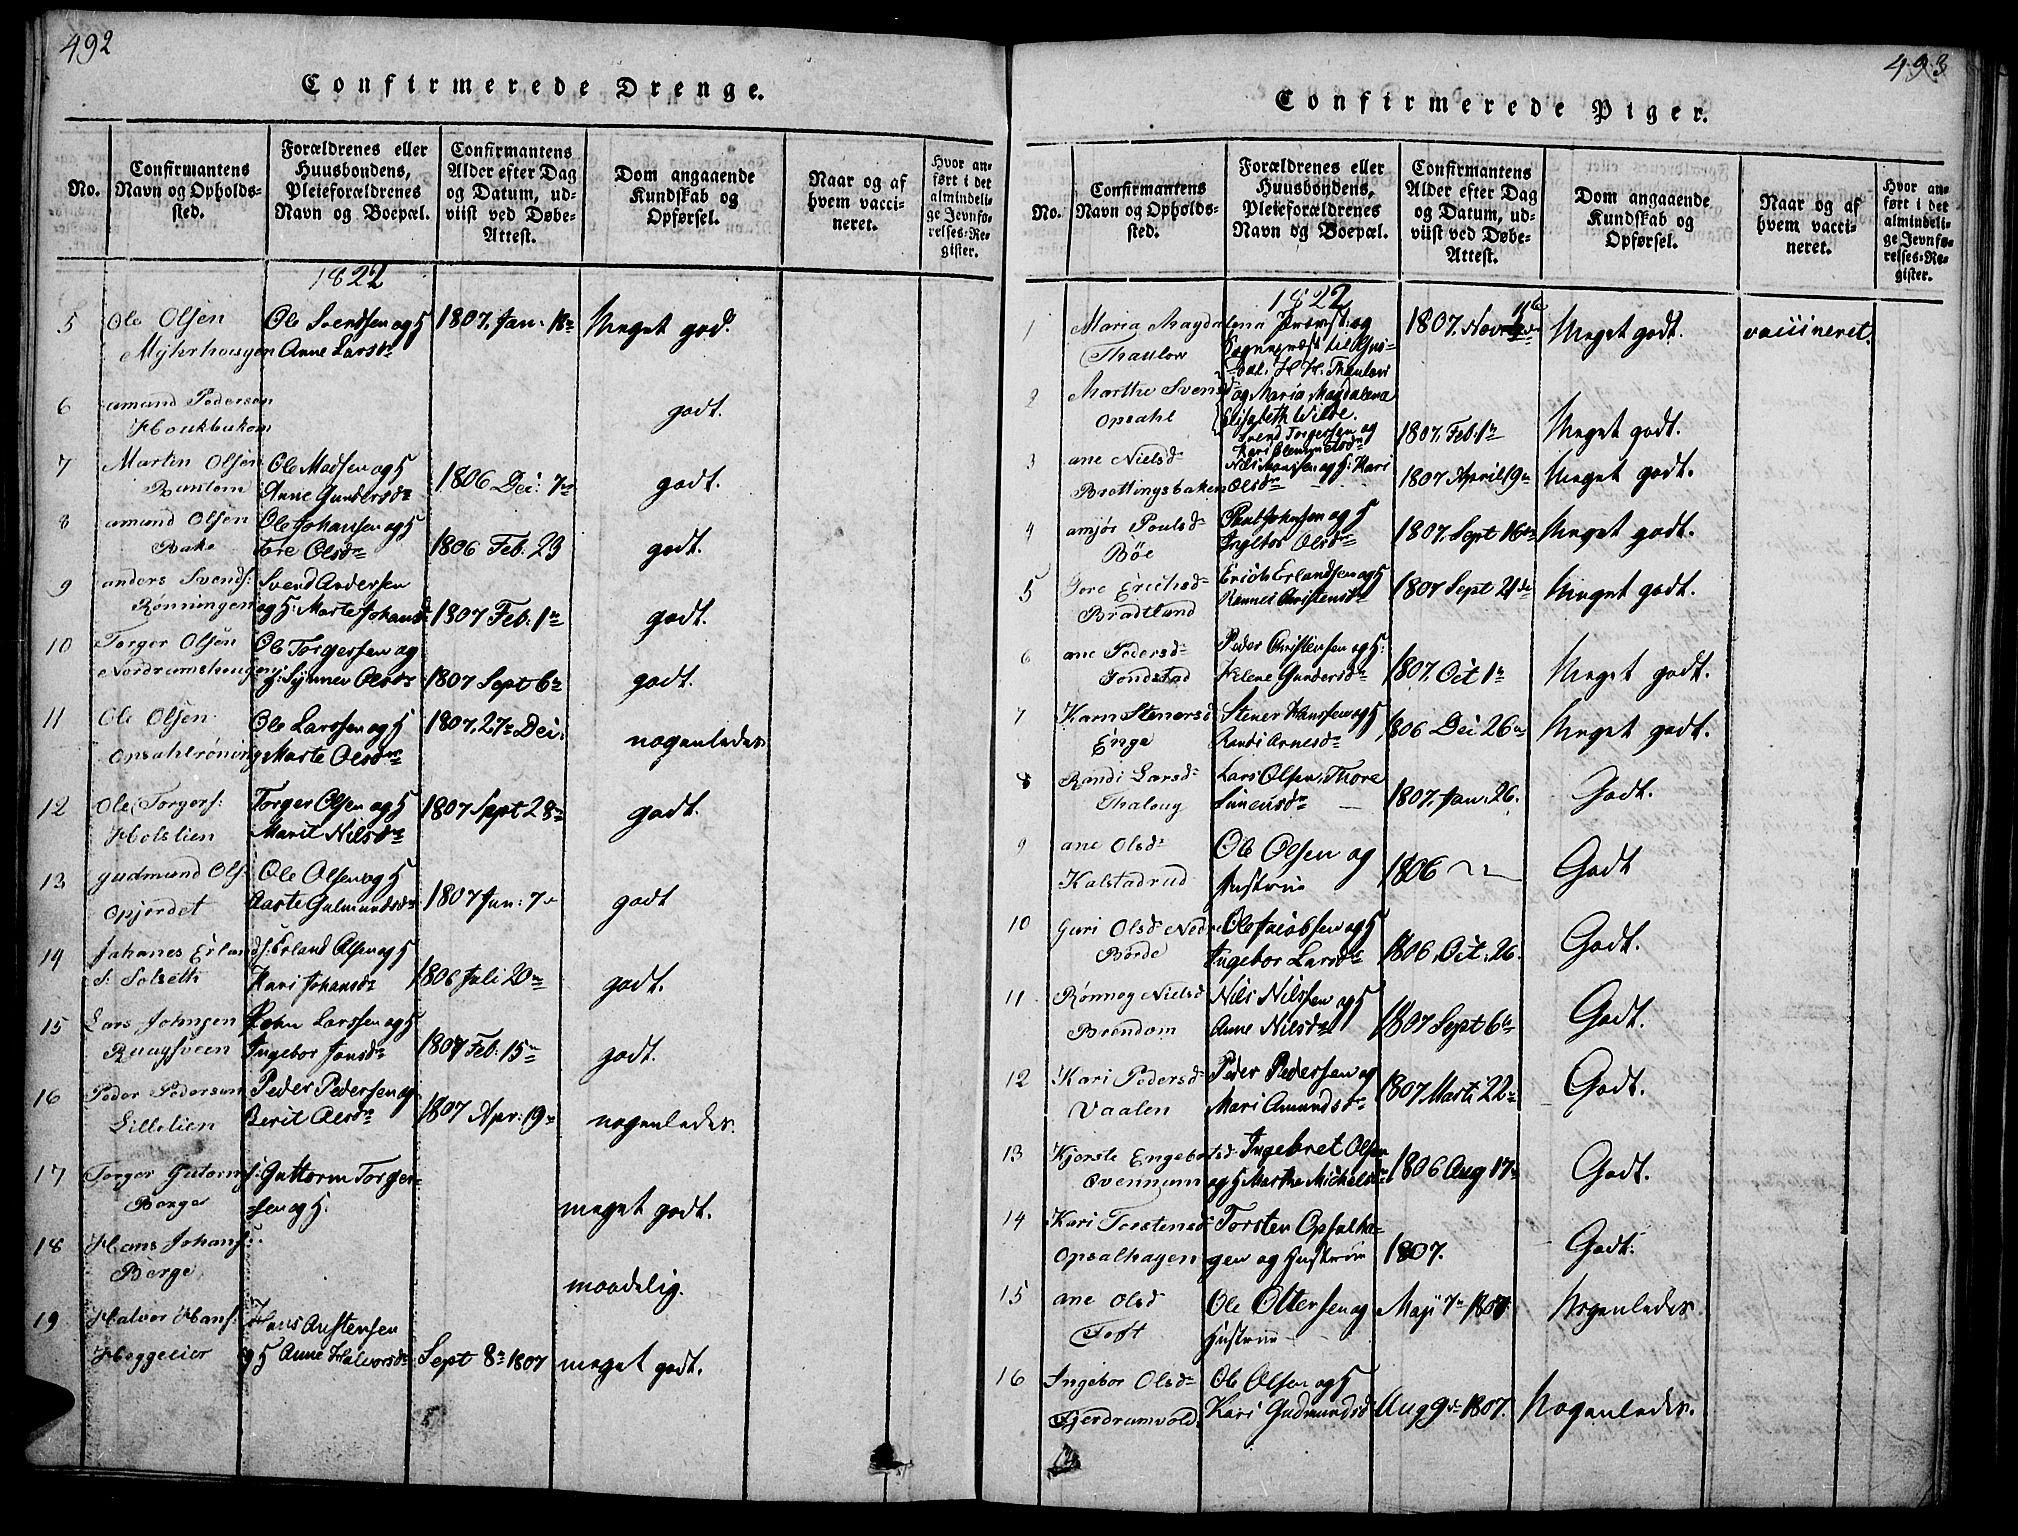 SAH, Gausdal prestekontor, Ministerialbok nr. 5, 1817-1829, s. 492-493